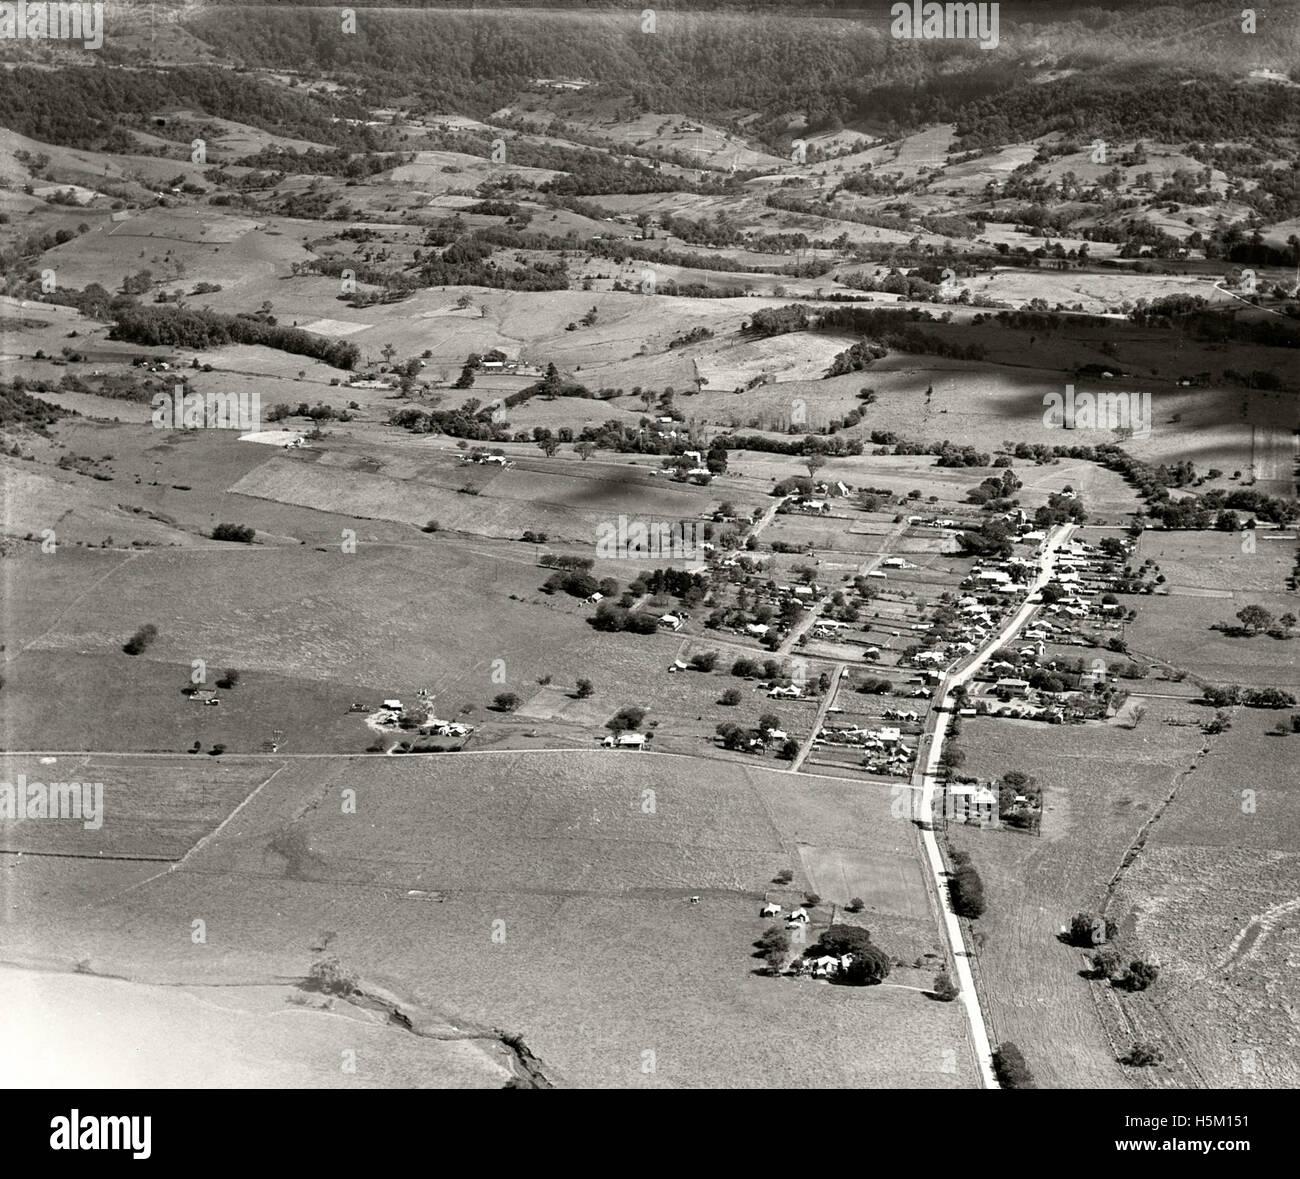 Jamberoo-South Coast-1936 RAHS - Stock Image